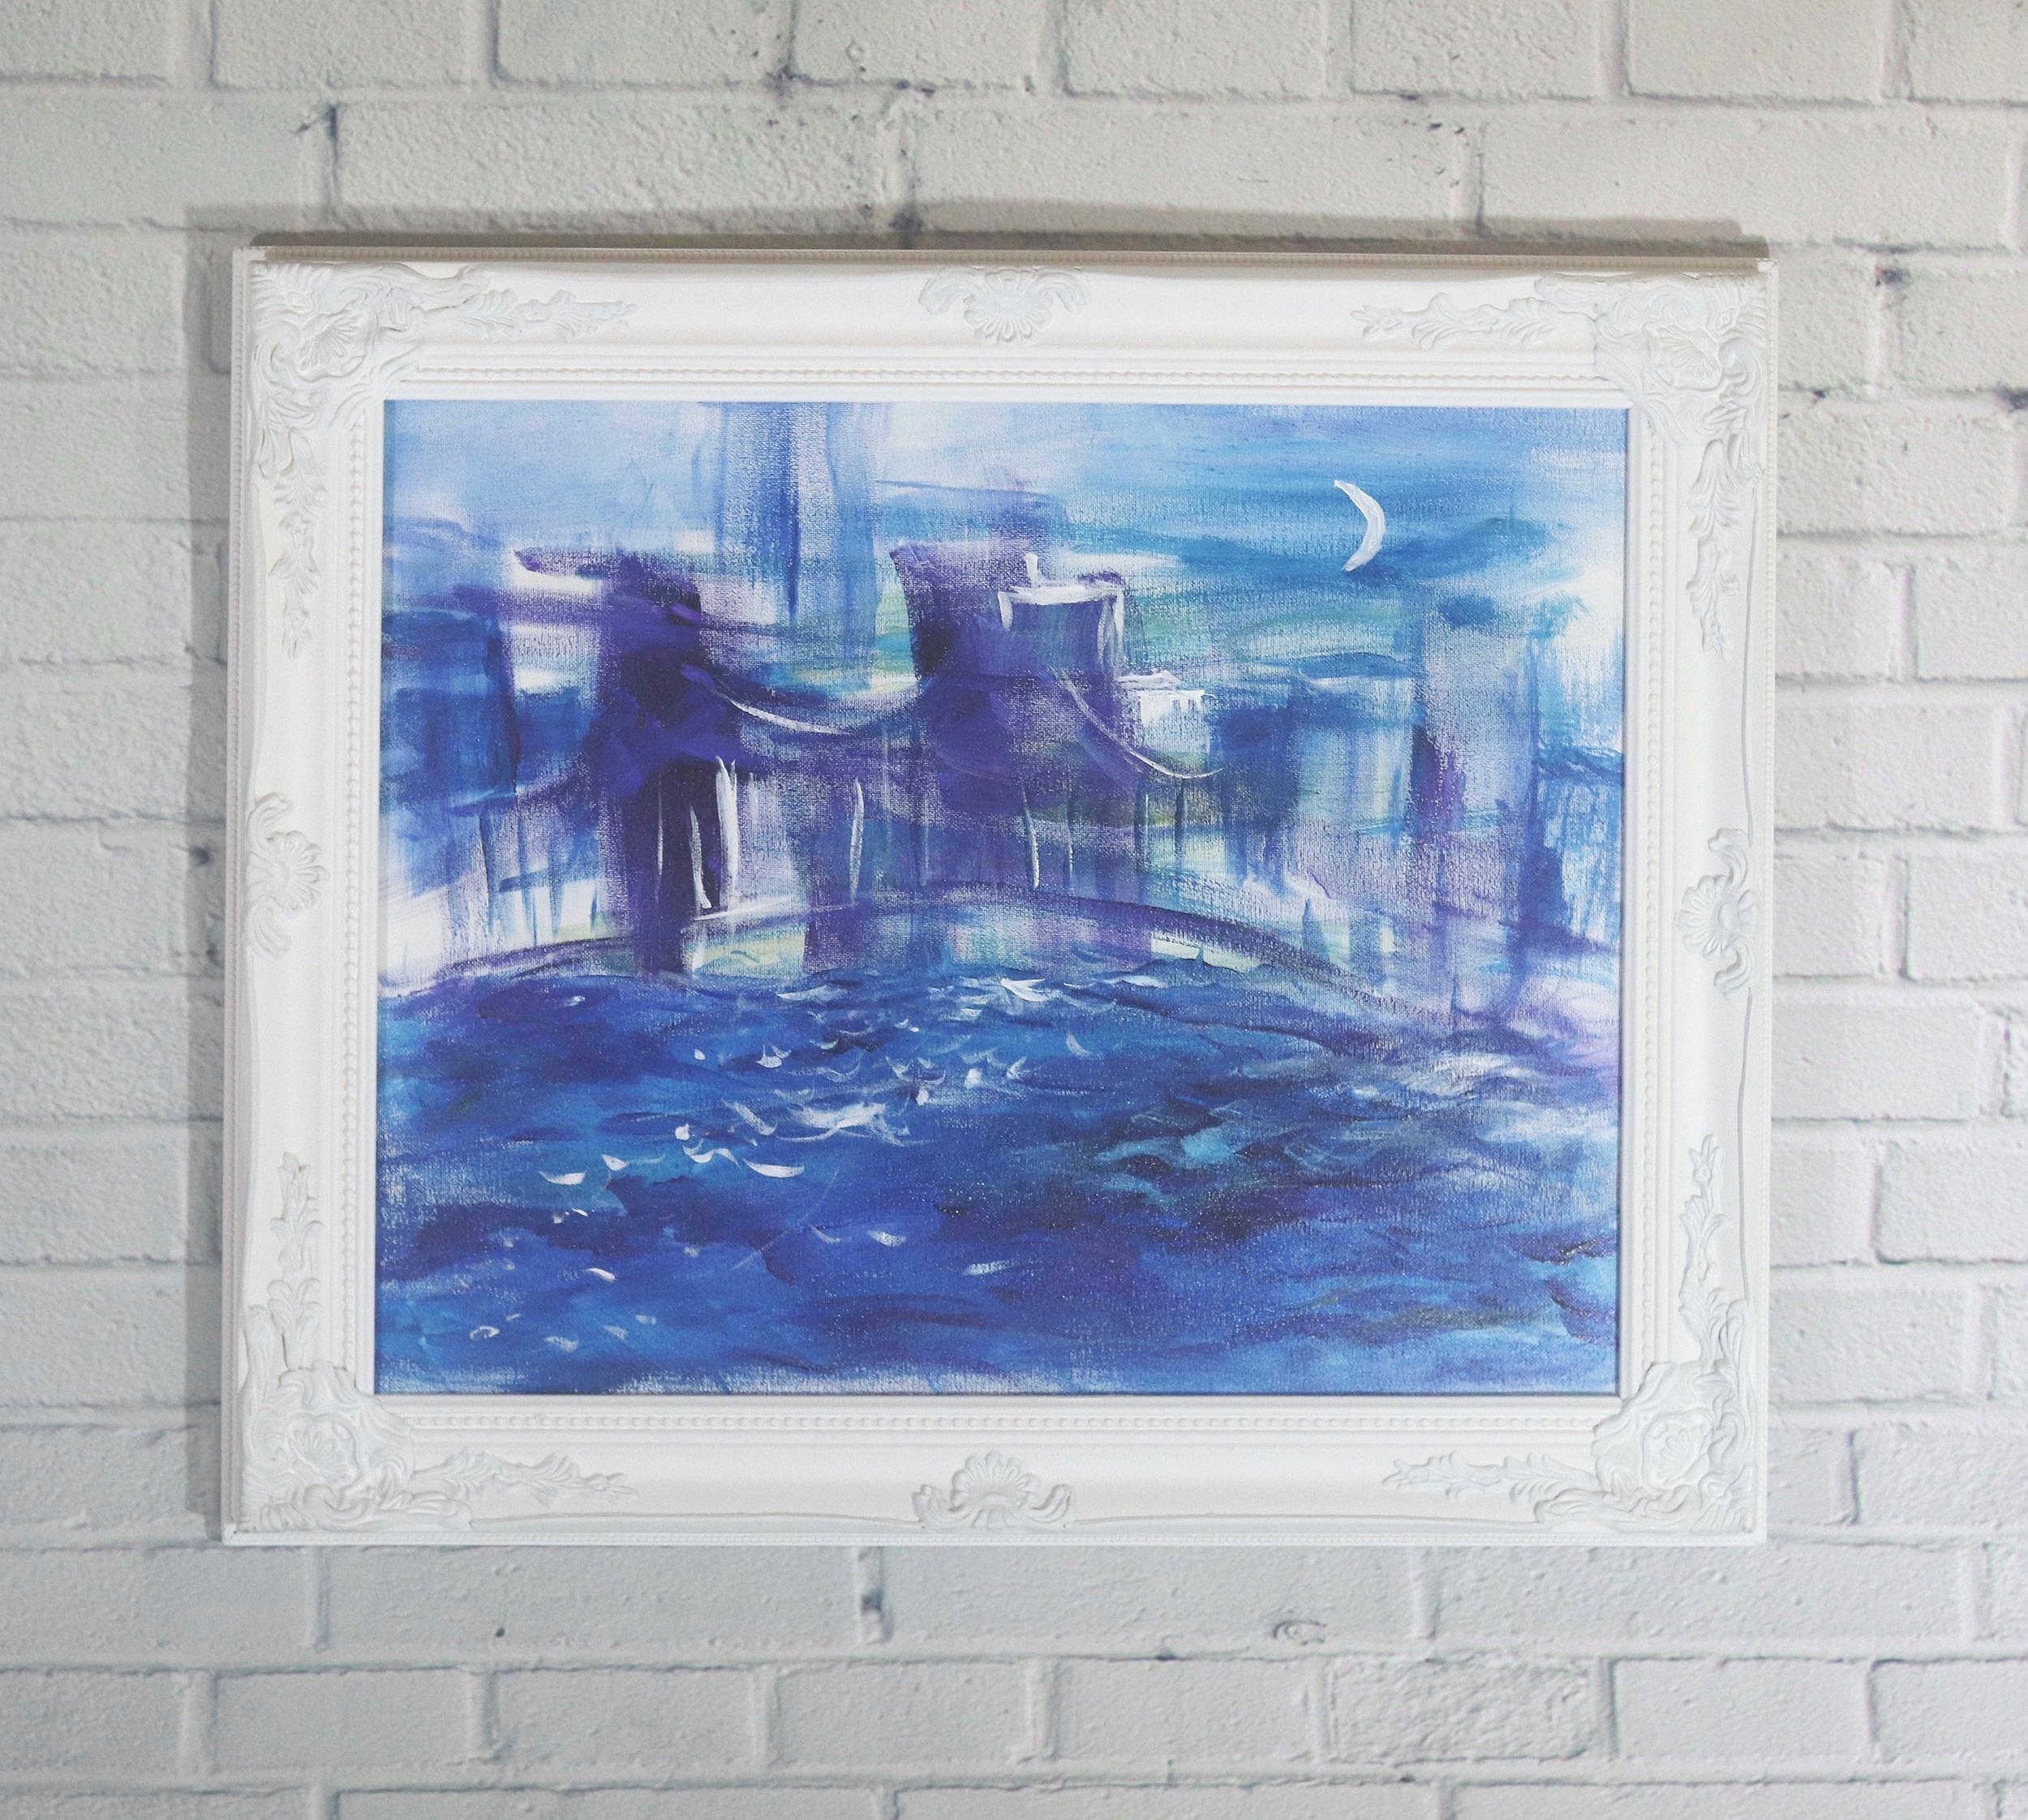 Concrete 16x20 Acrylic on Canvas